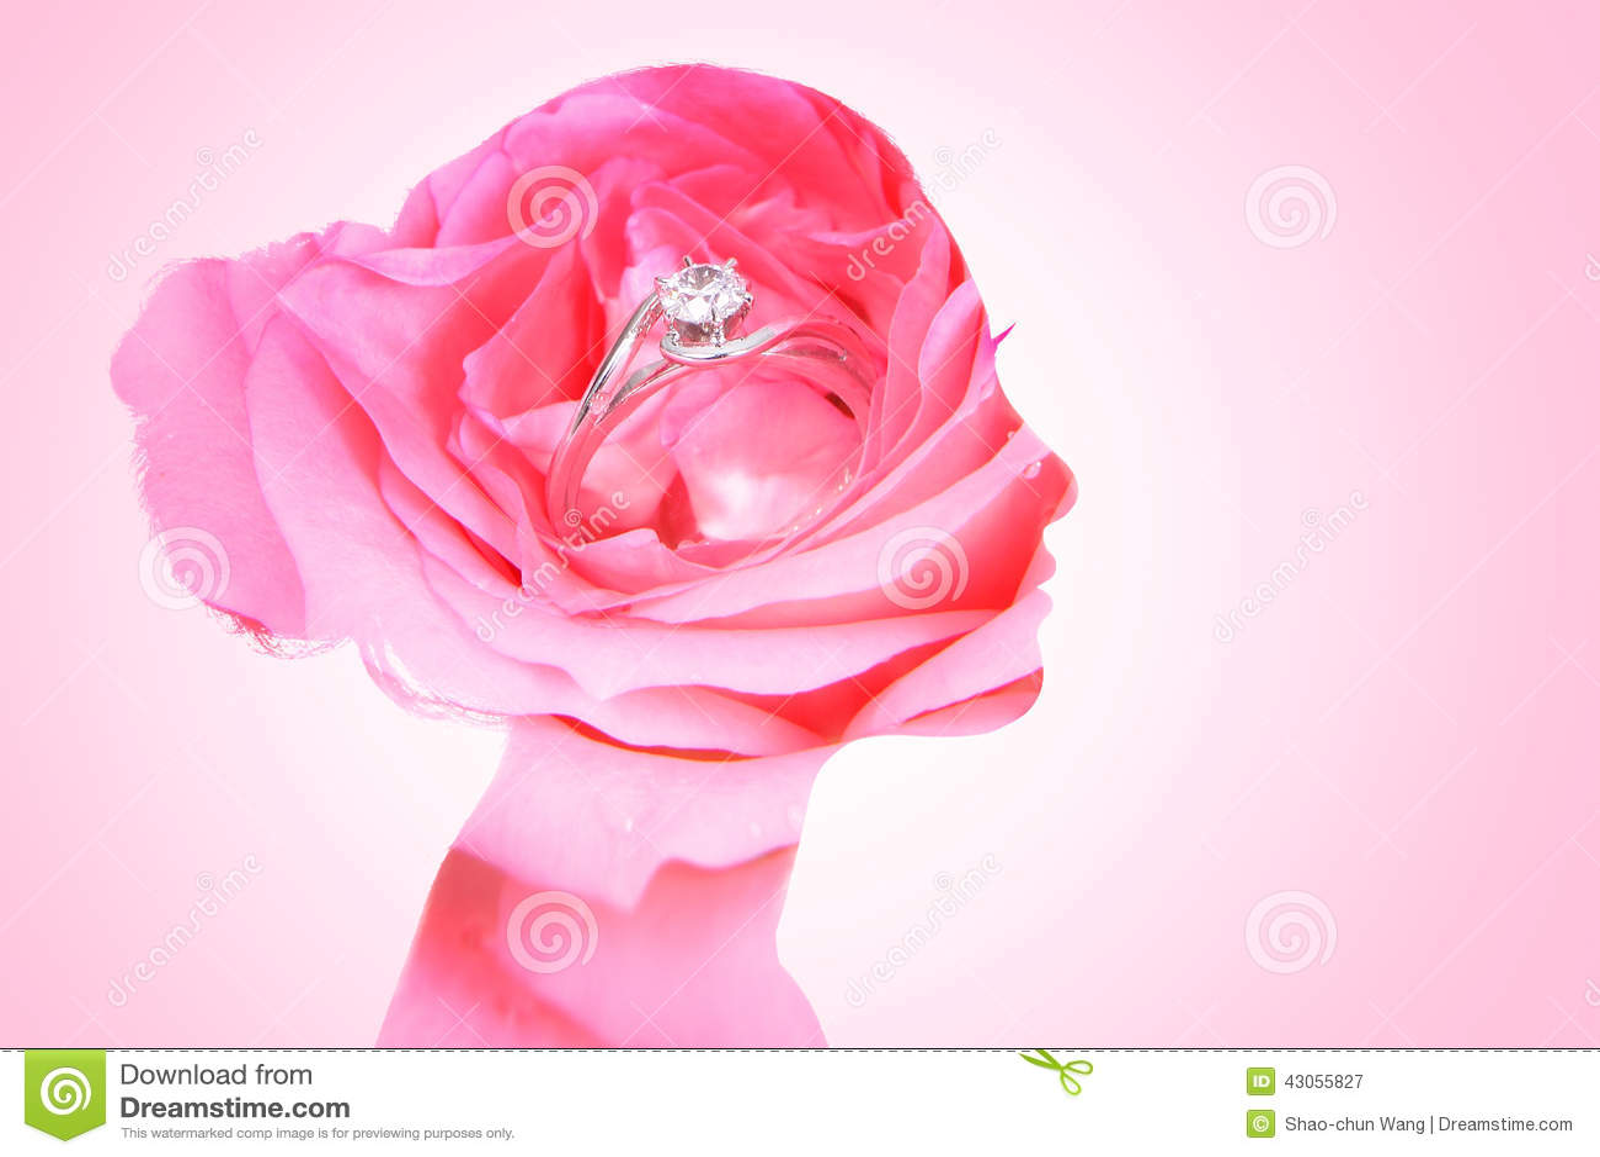 Double Exposure Of Beauty Bride Stock Image - Image of bouquet ...